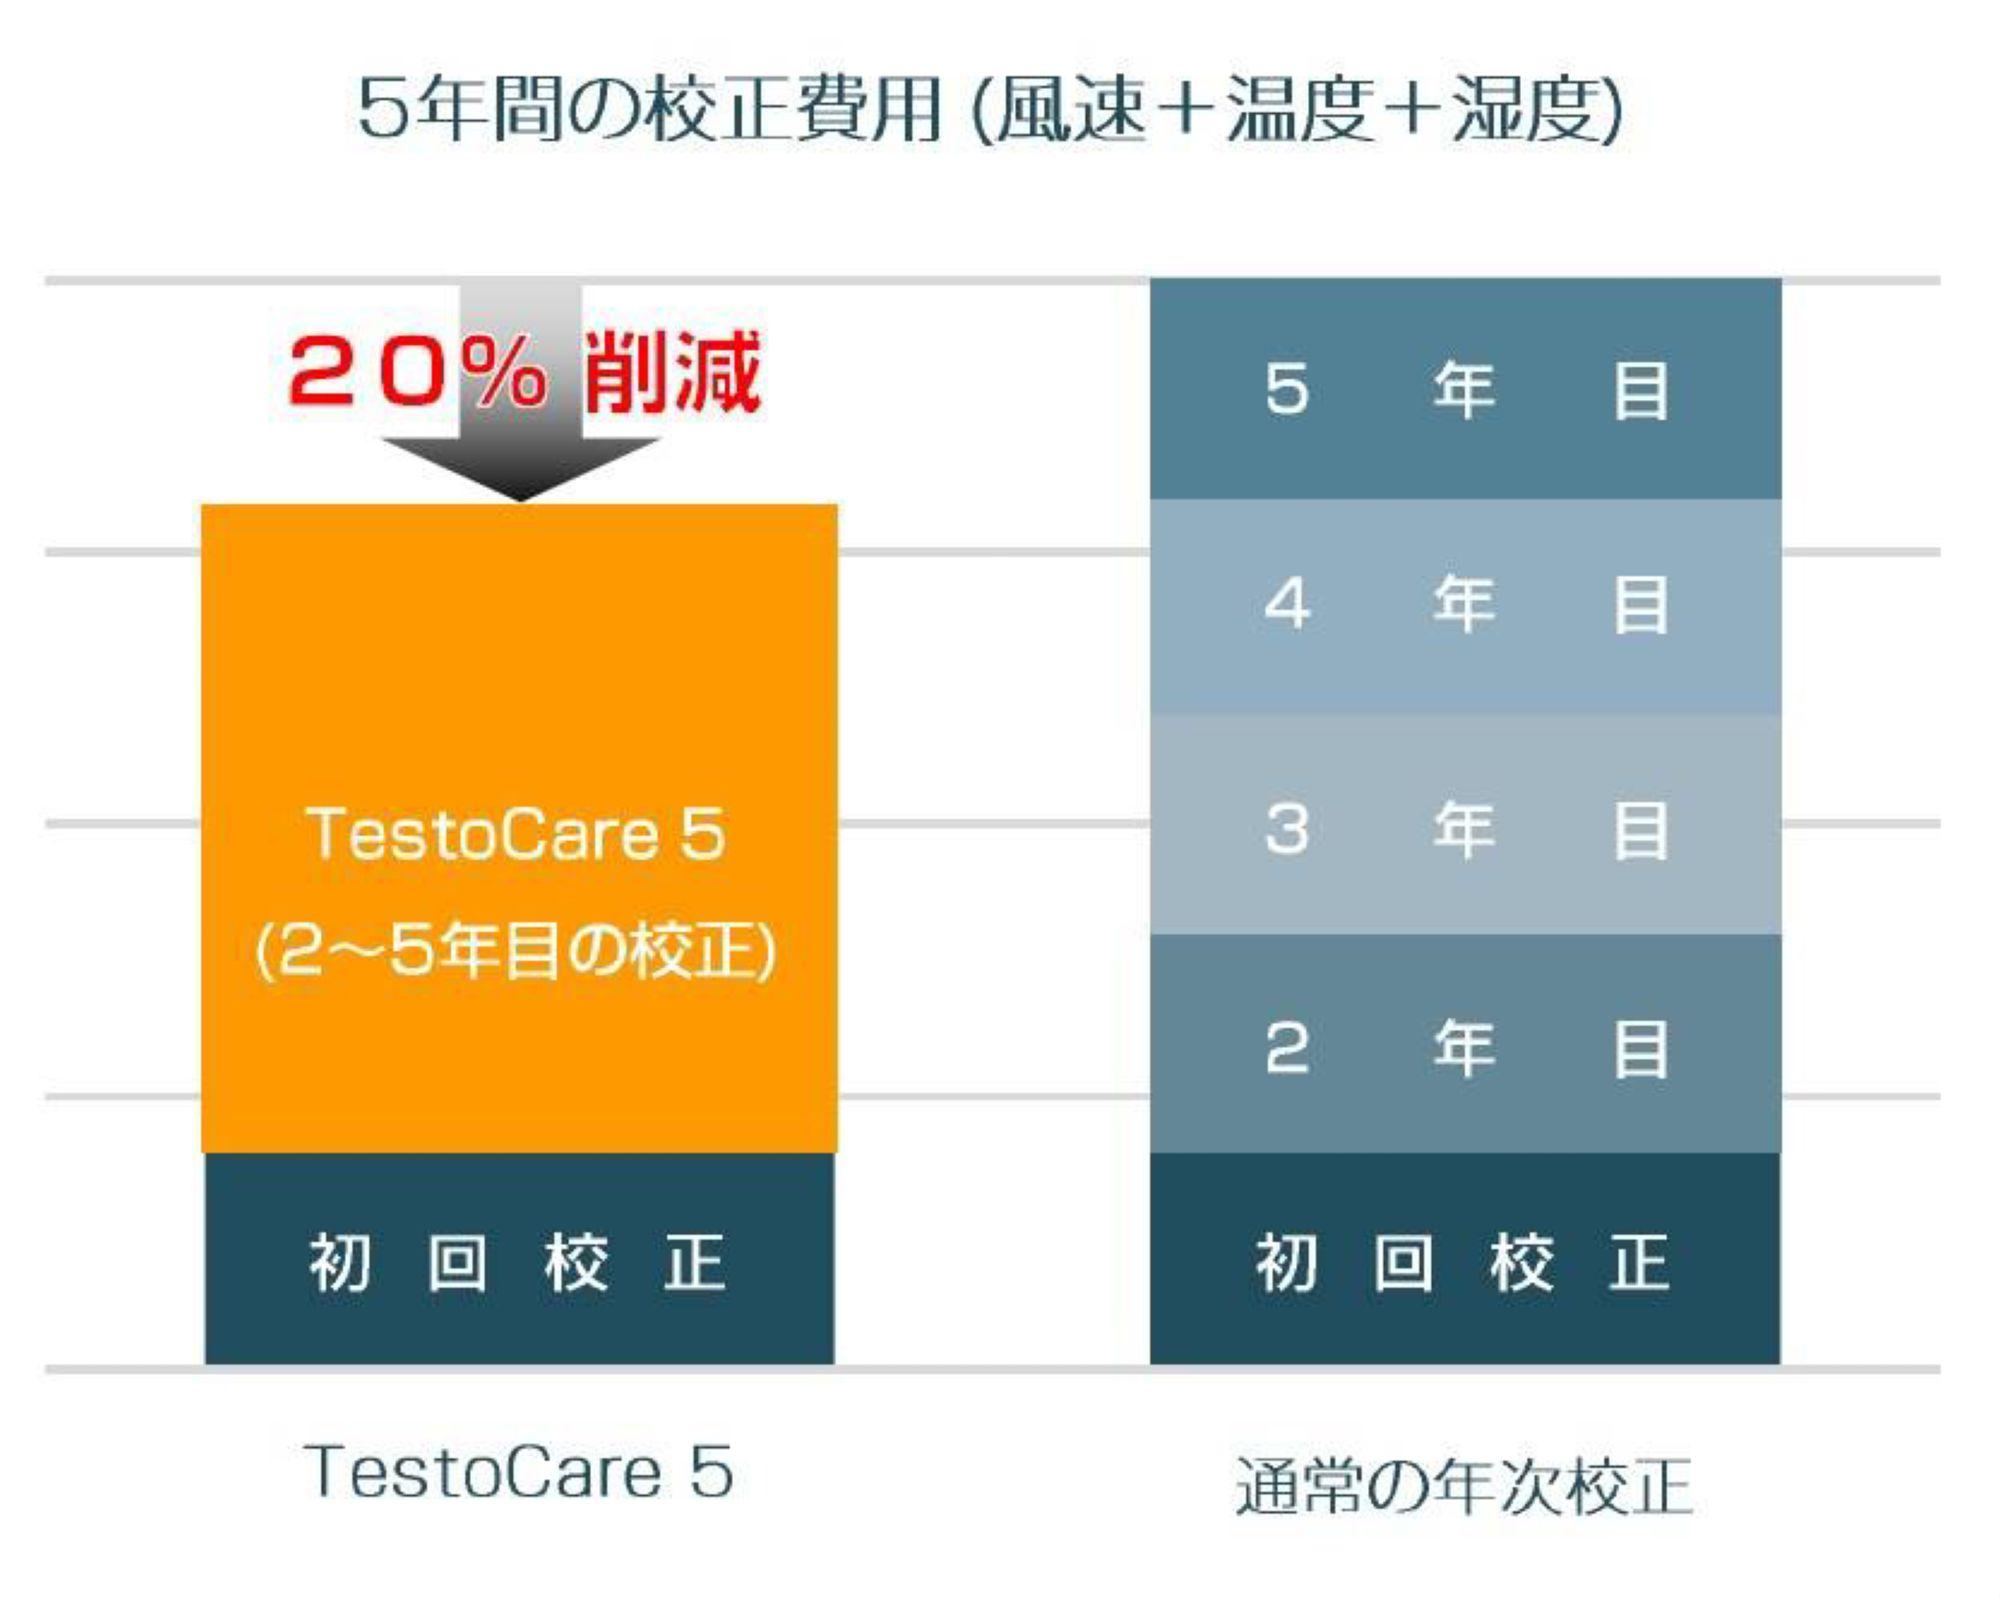 Jp_testo_care_new.jpg